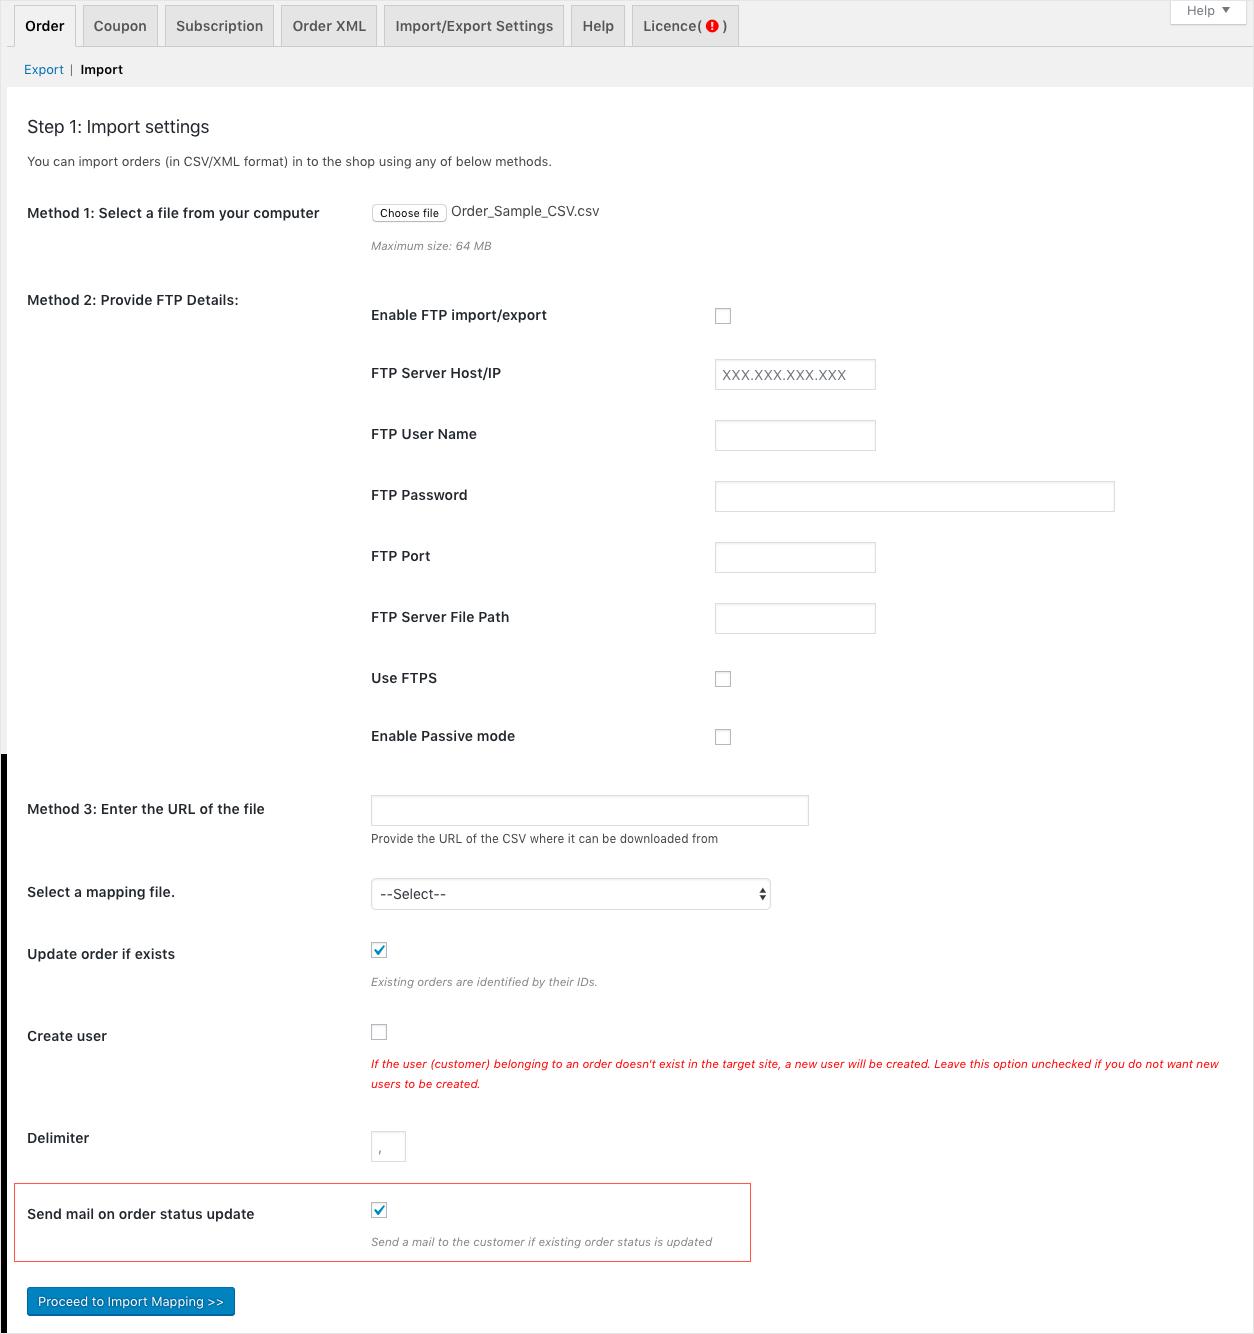 WooCommerce Order Import-Send email on Order status update